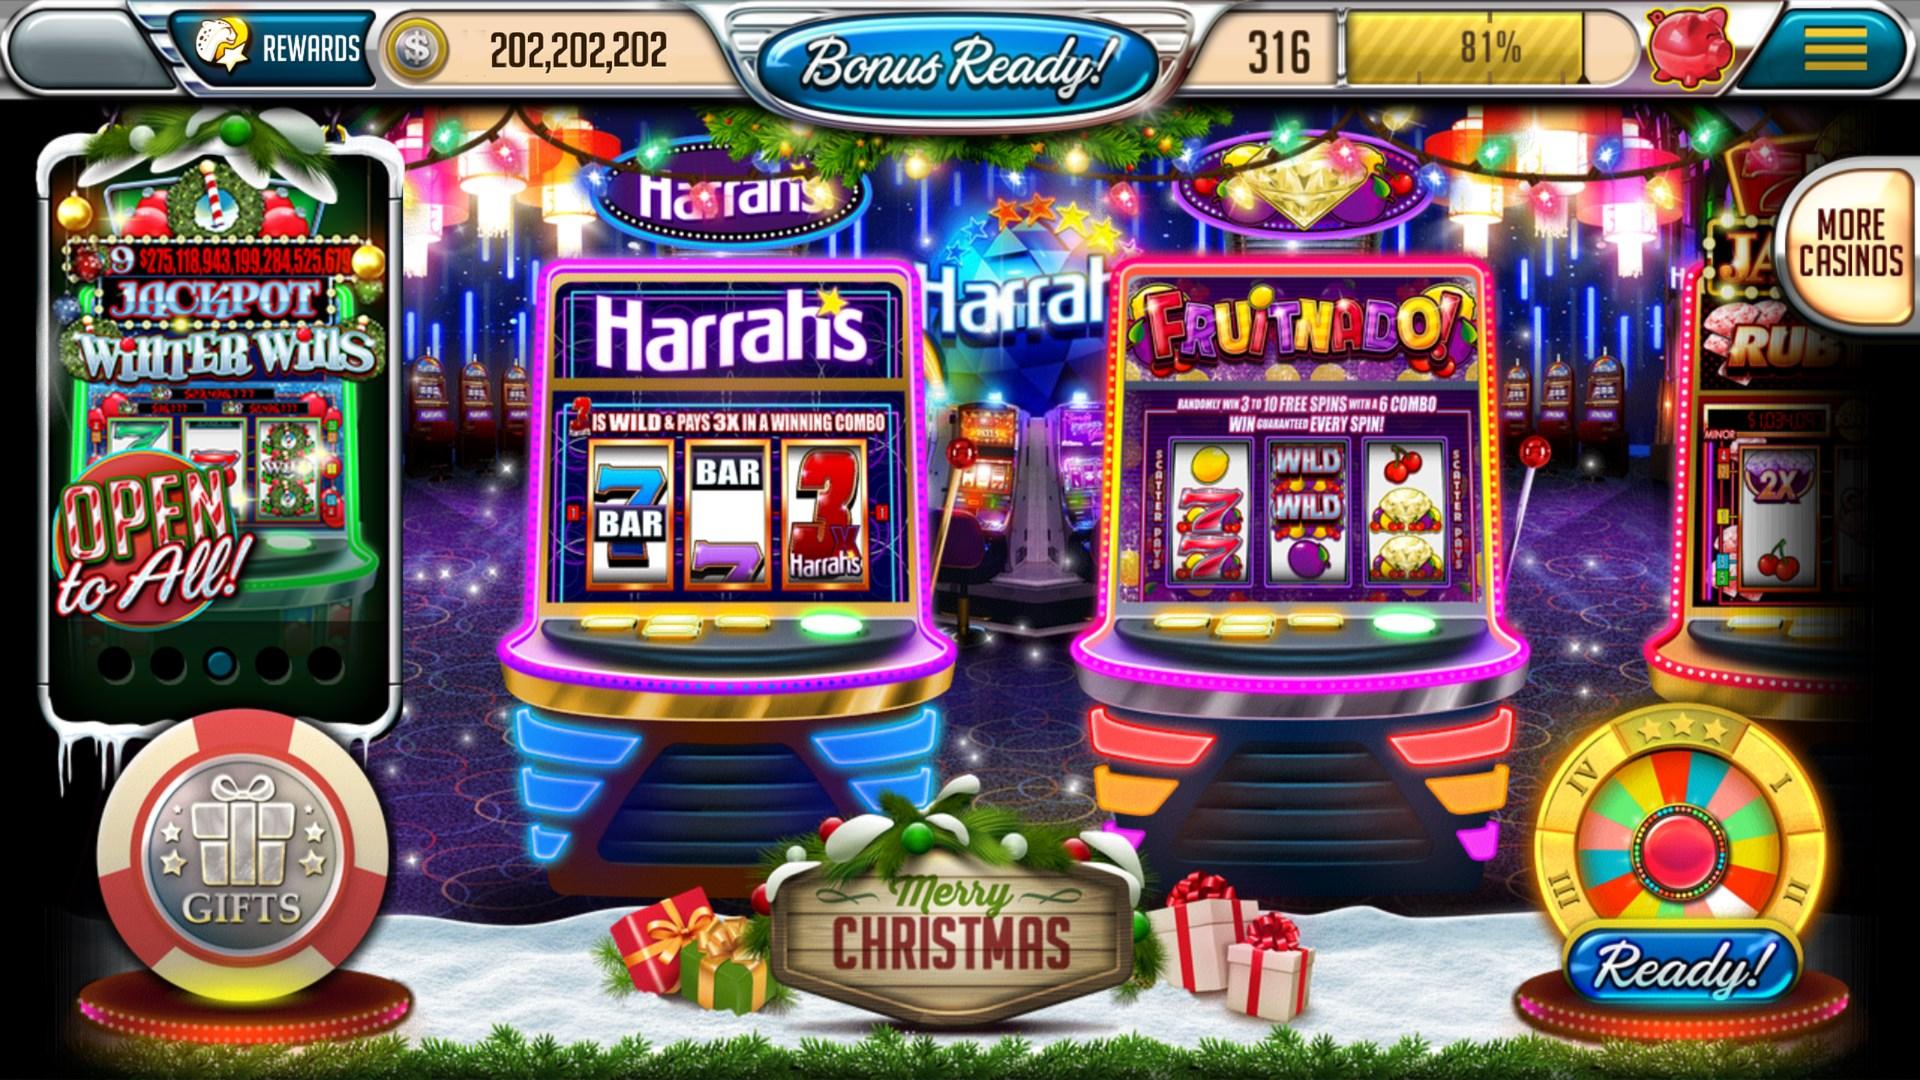 Harrass casino online gambling laws in canada